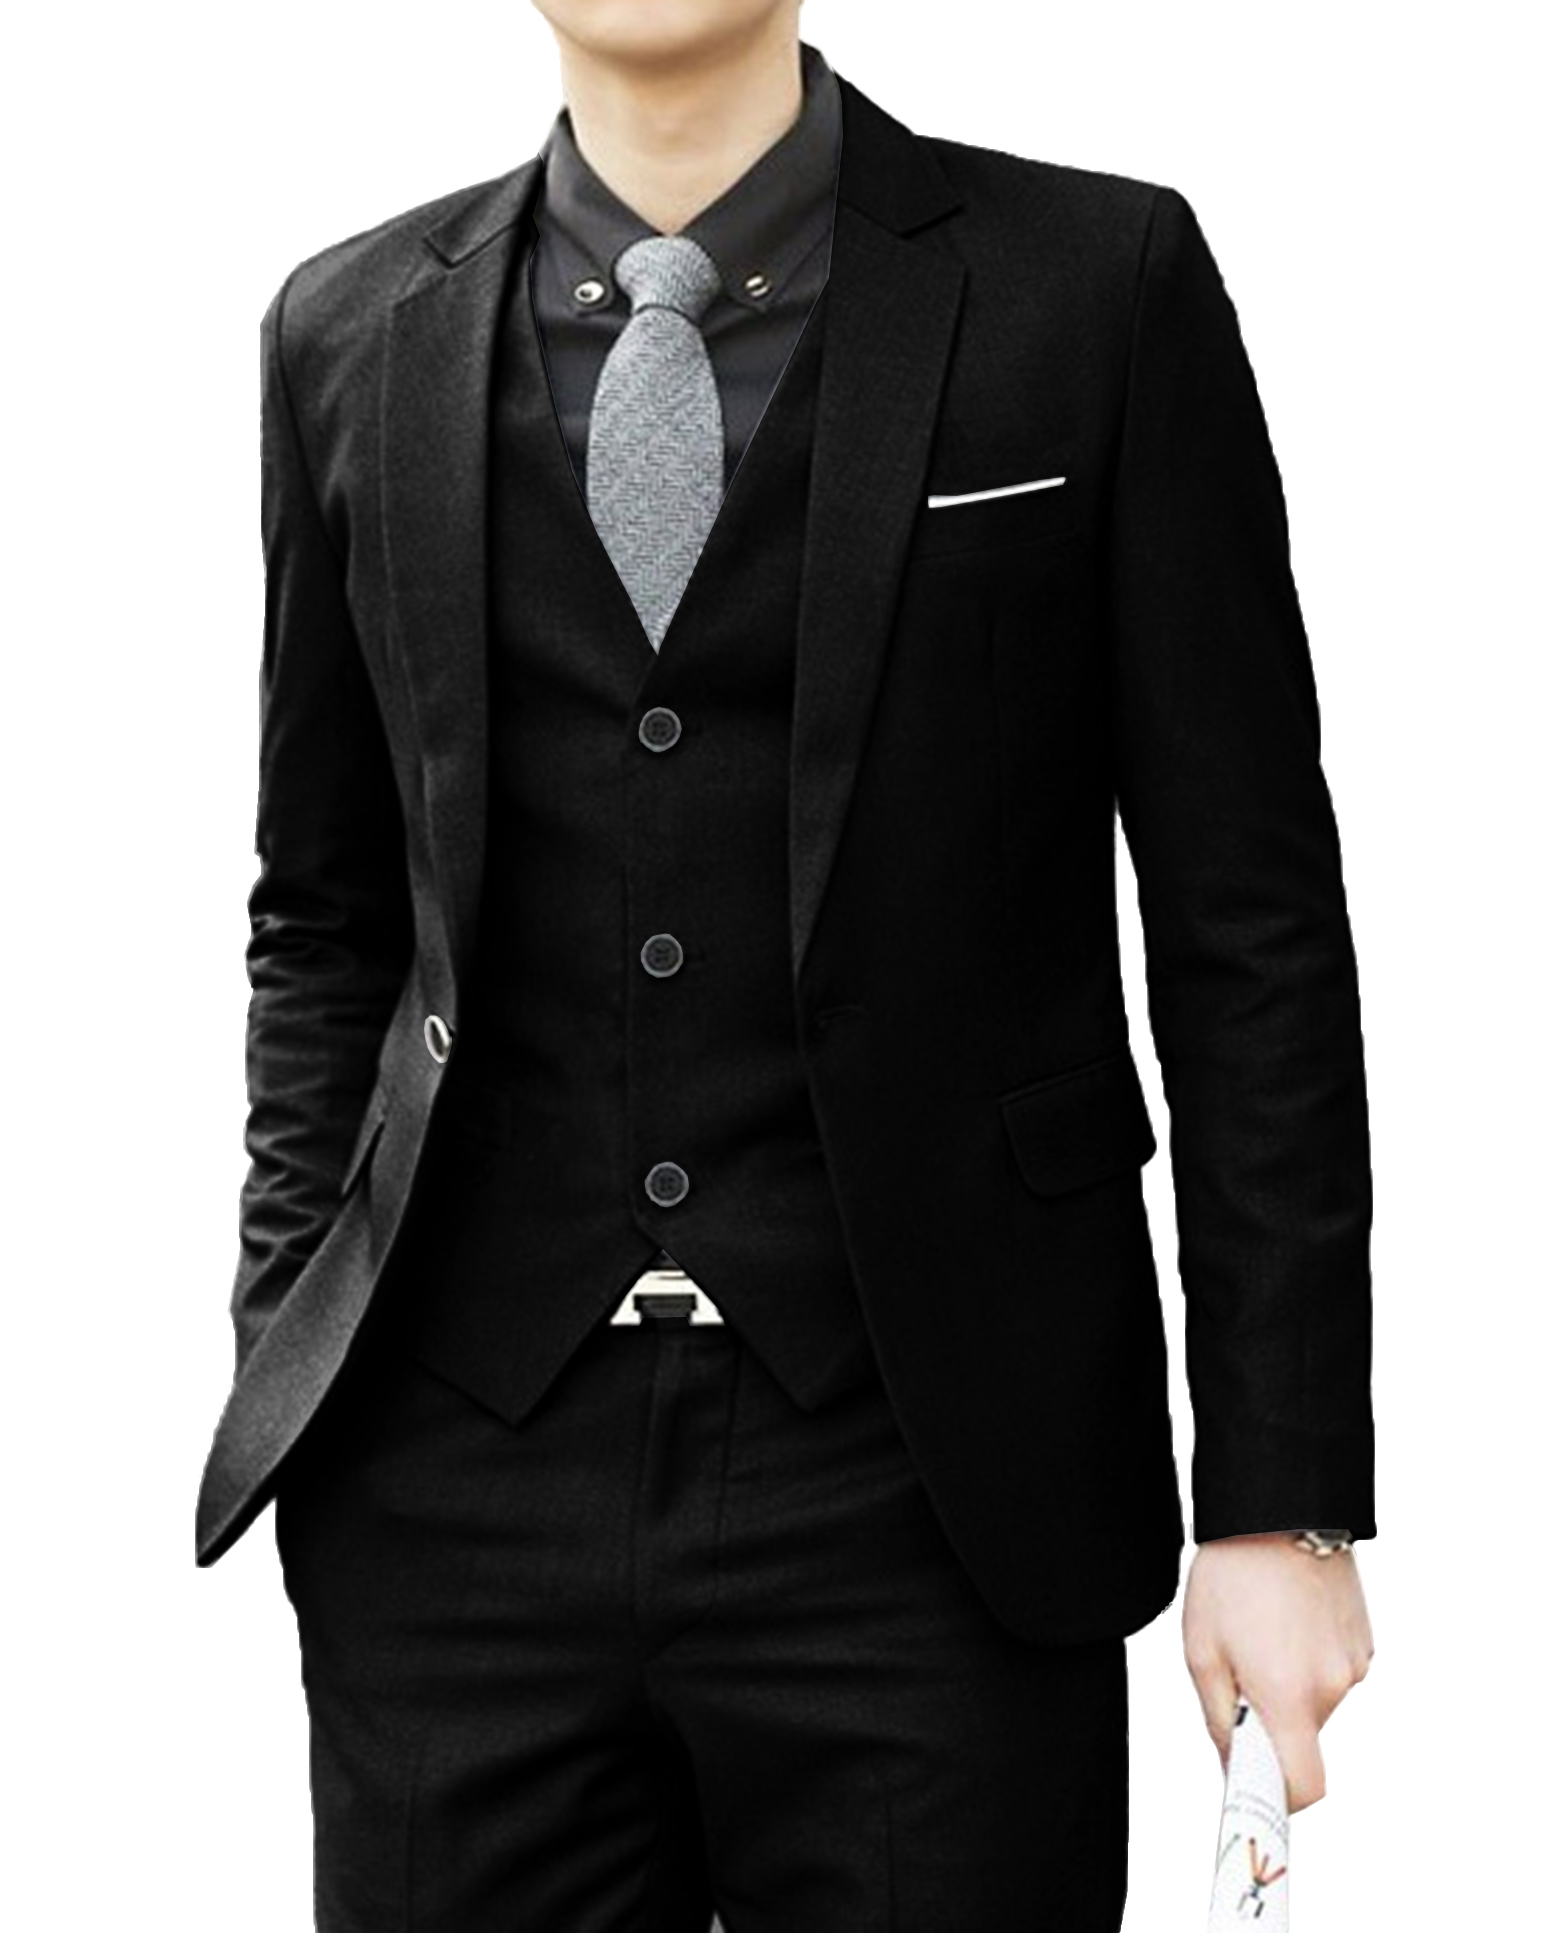 Casual Slim Fit Men's Suit Three 3 Piece Wedding Tuxedo Party Dresses Suit Groomsmen Blazers Formal Business Jacket Set